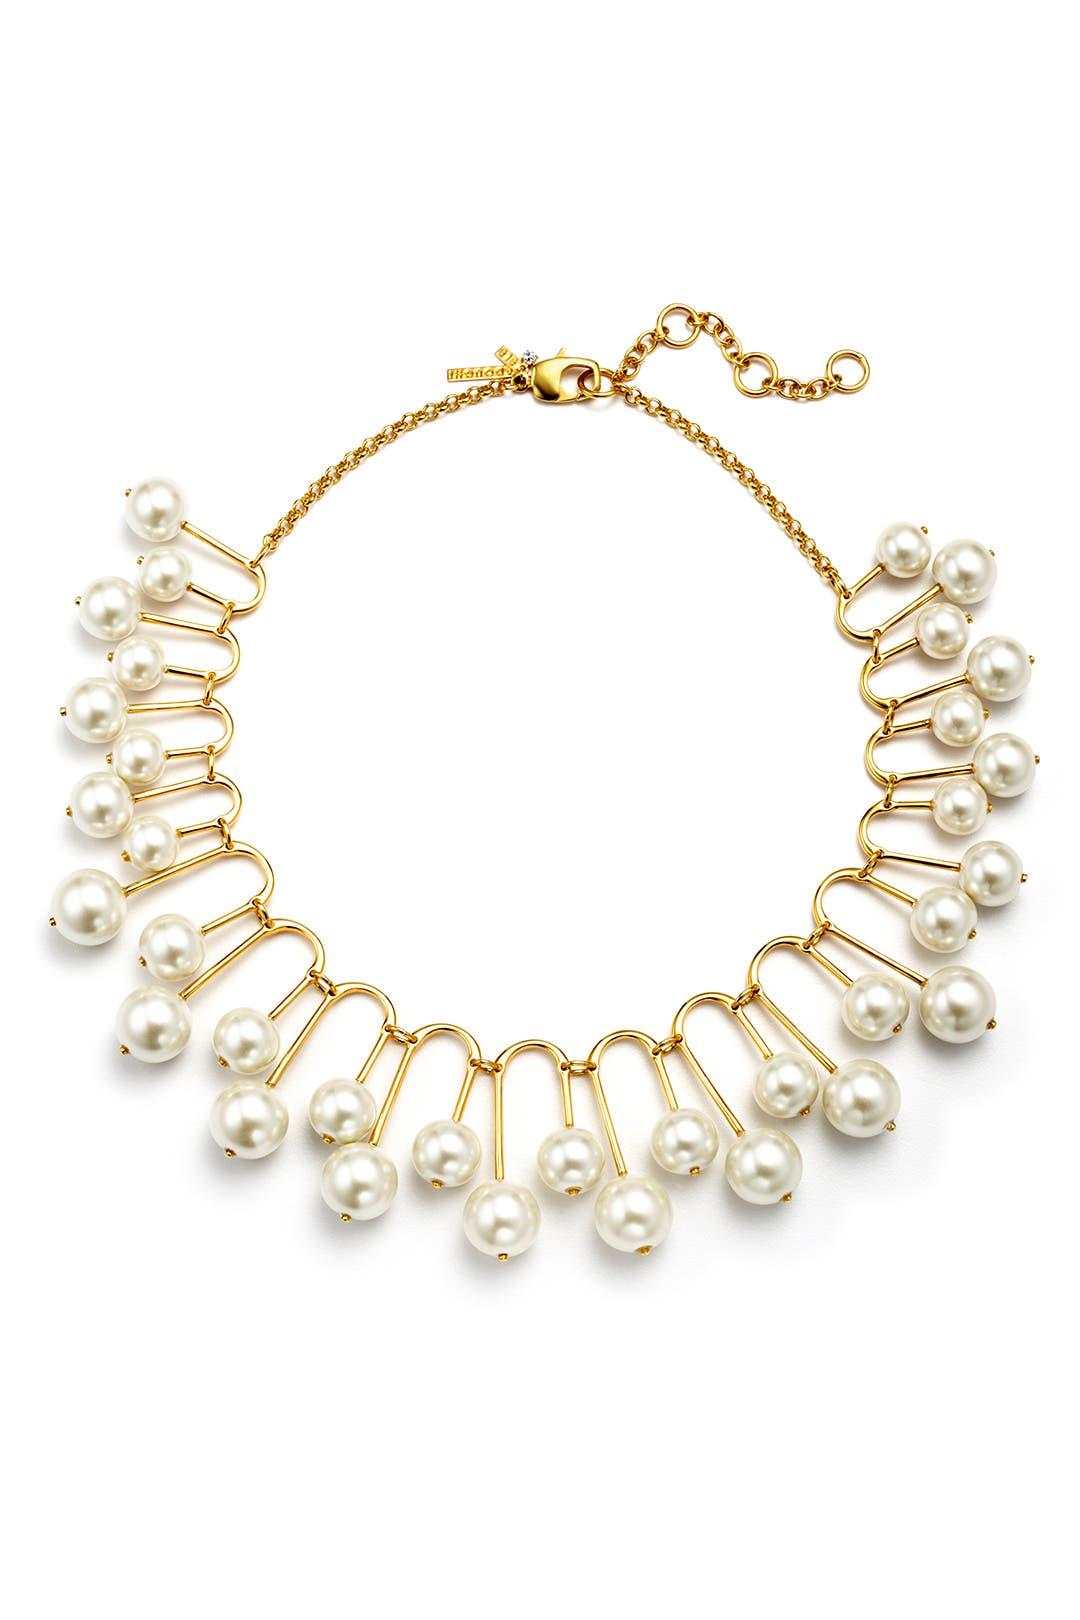 Heartbreaker Necklace by Lele Sadoughi